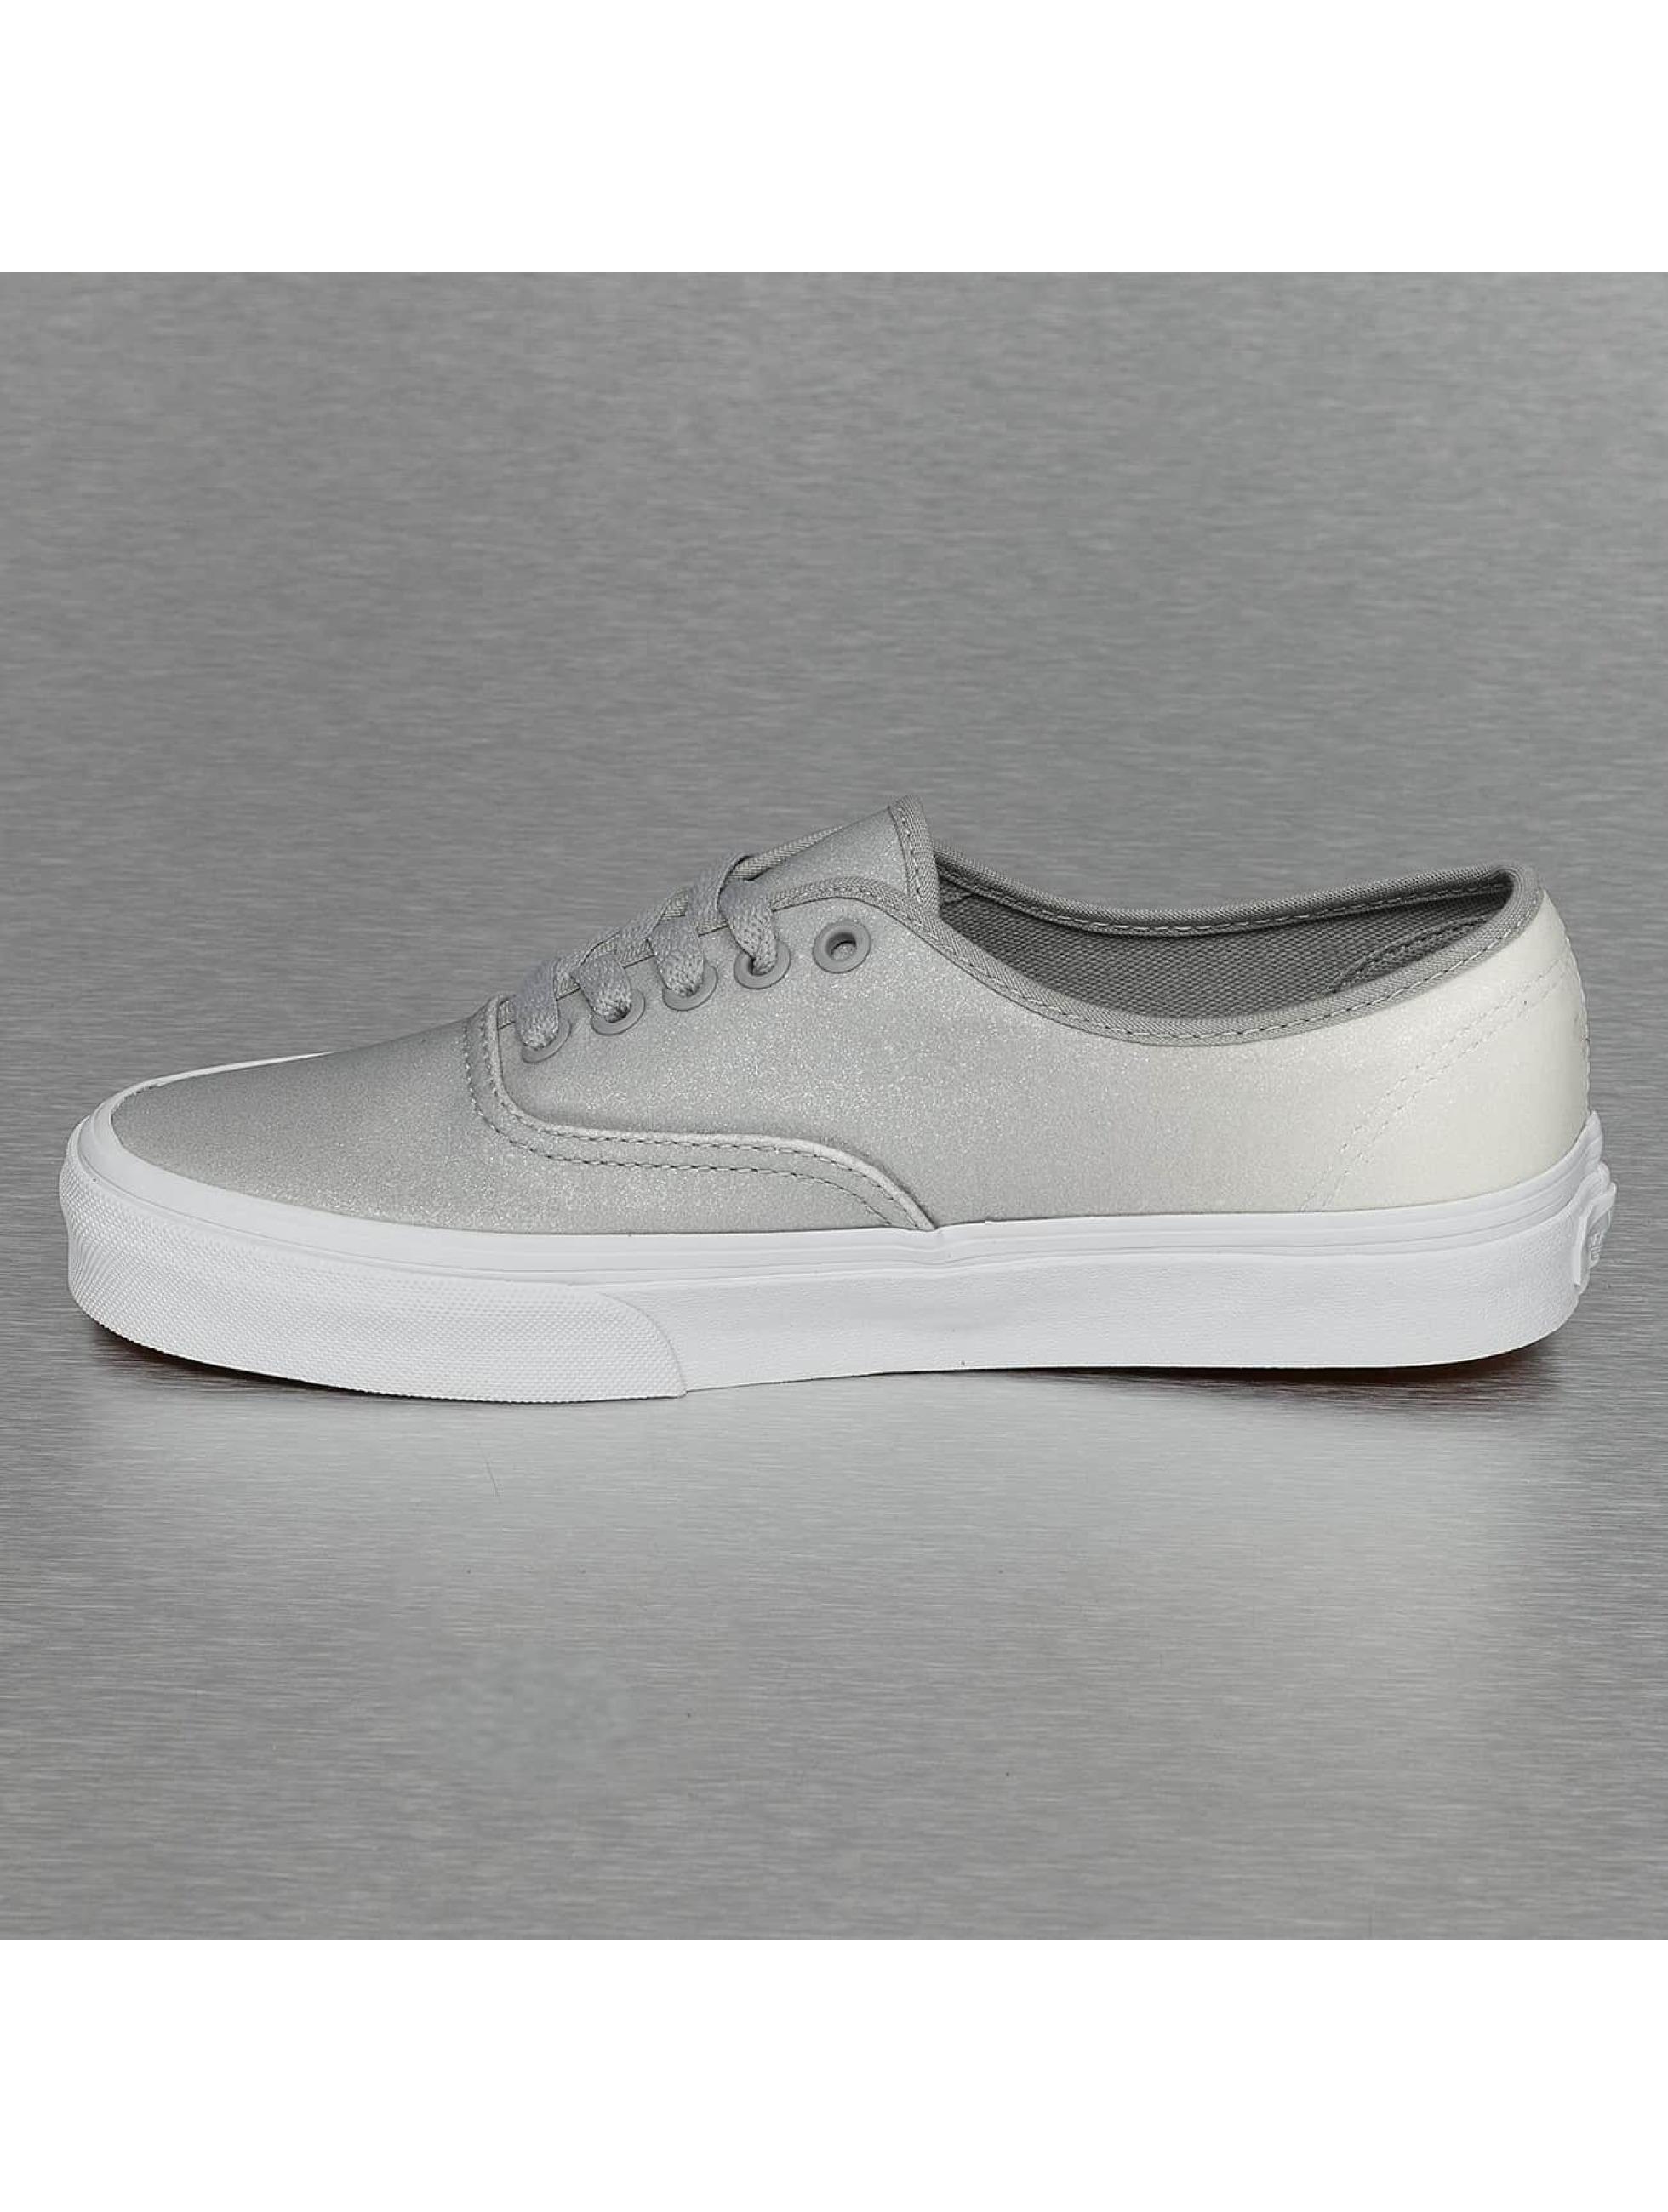 Vans sneaker Authentic 2 Tone Glitter wit